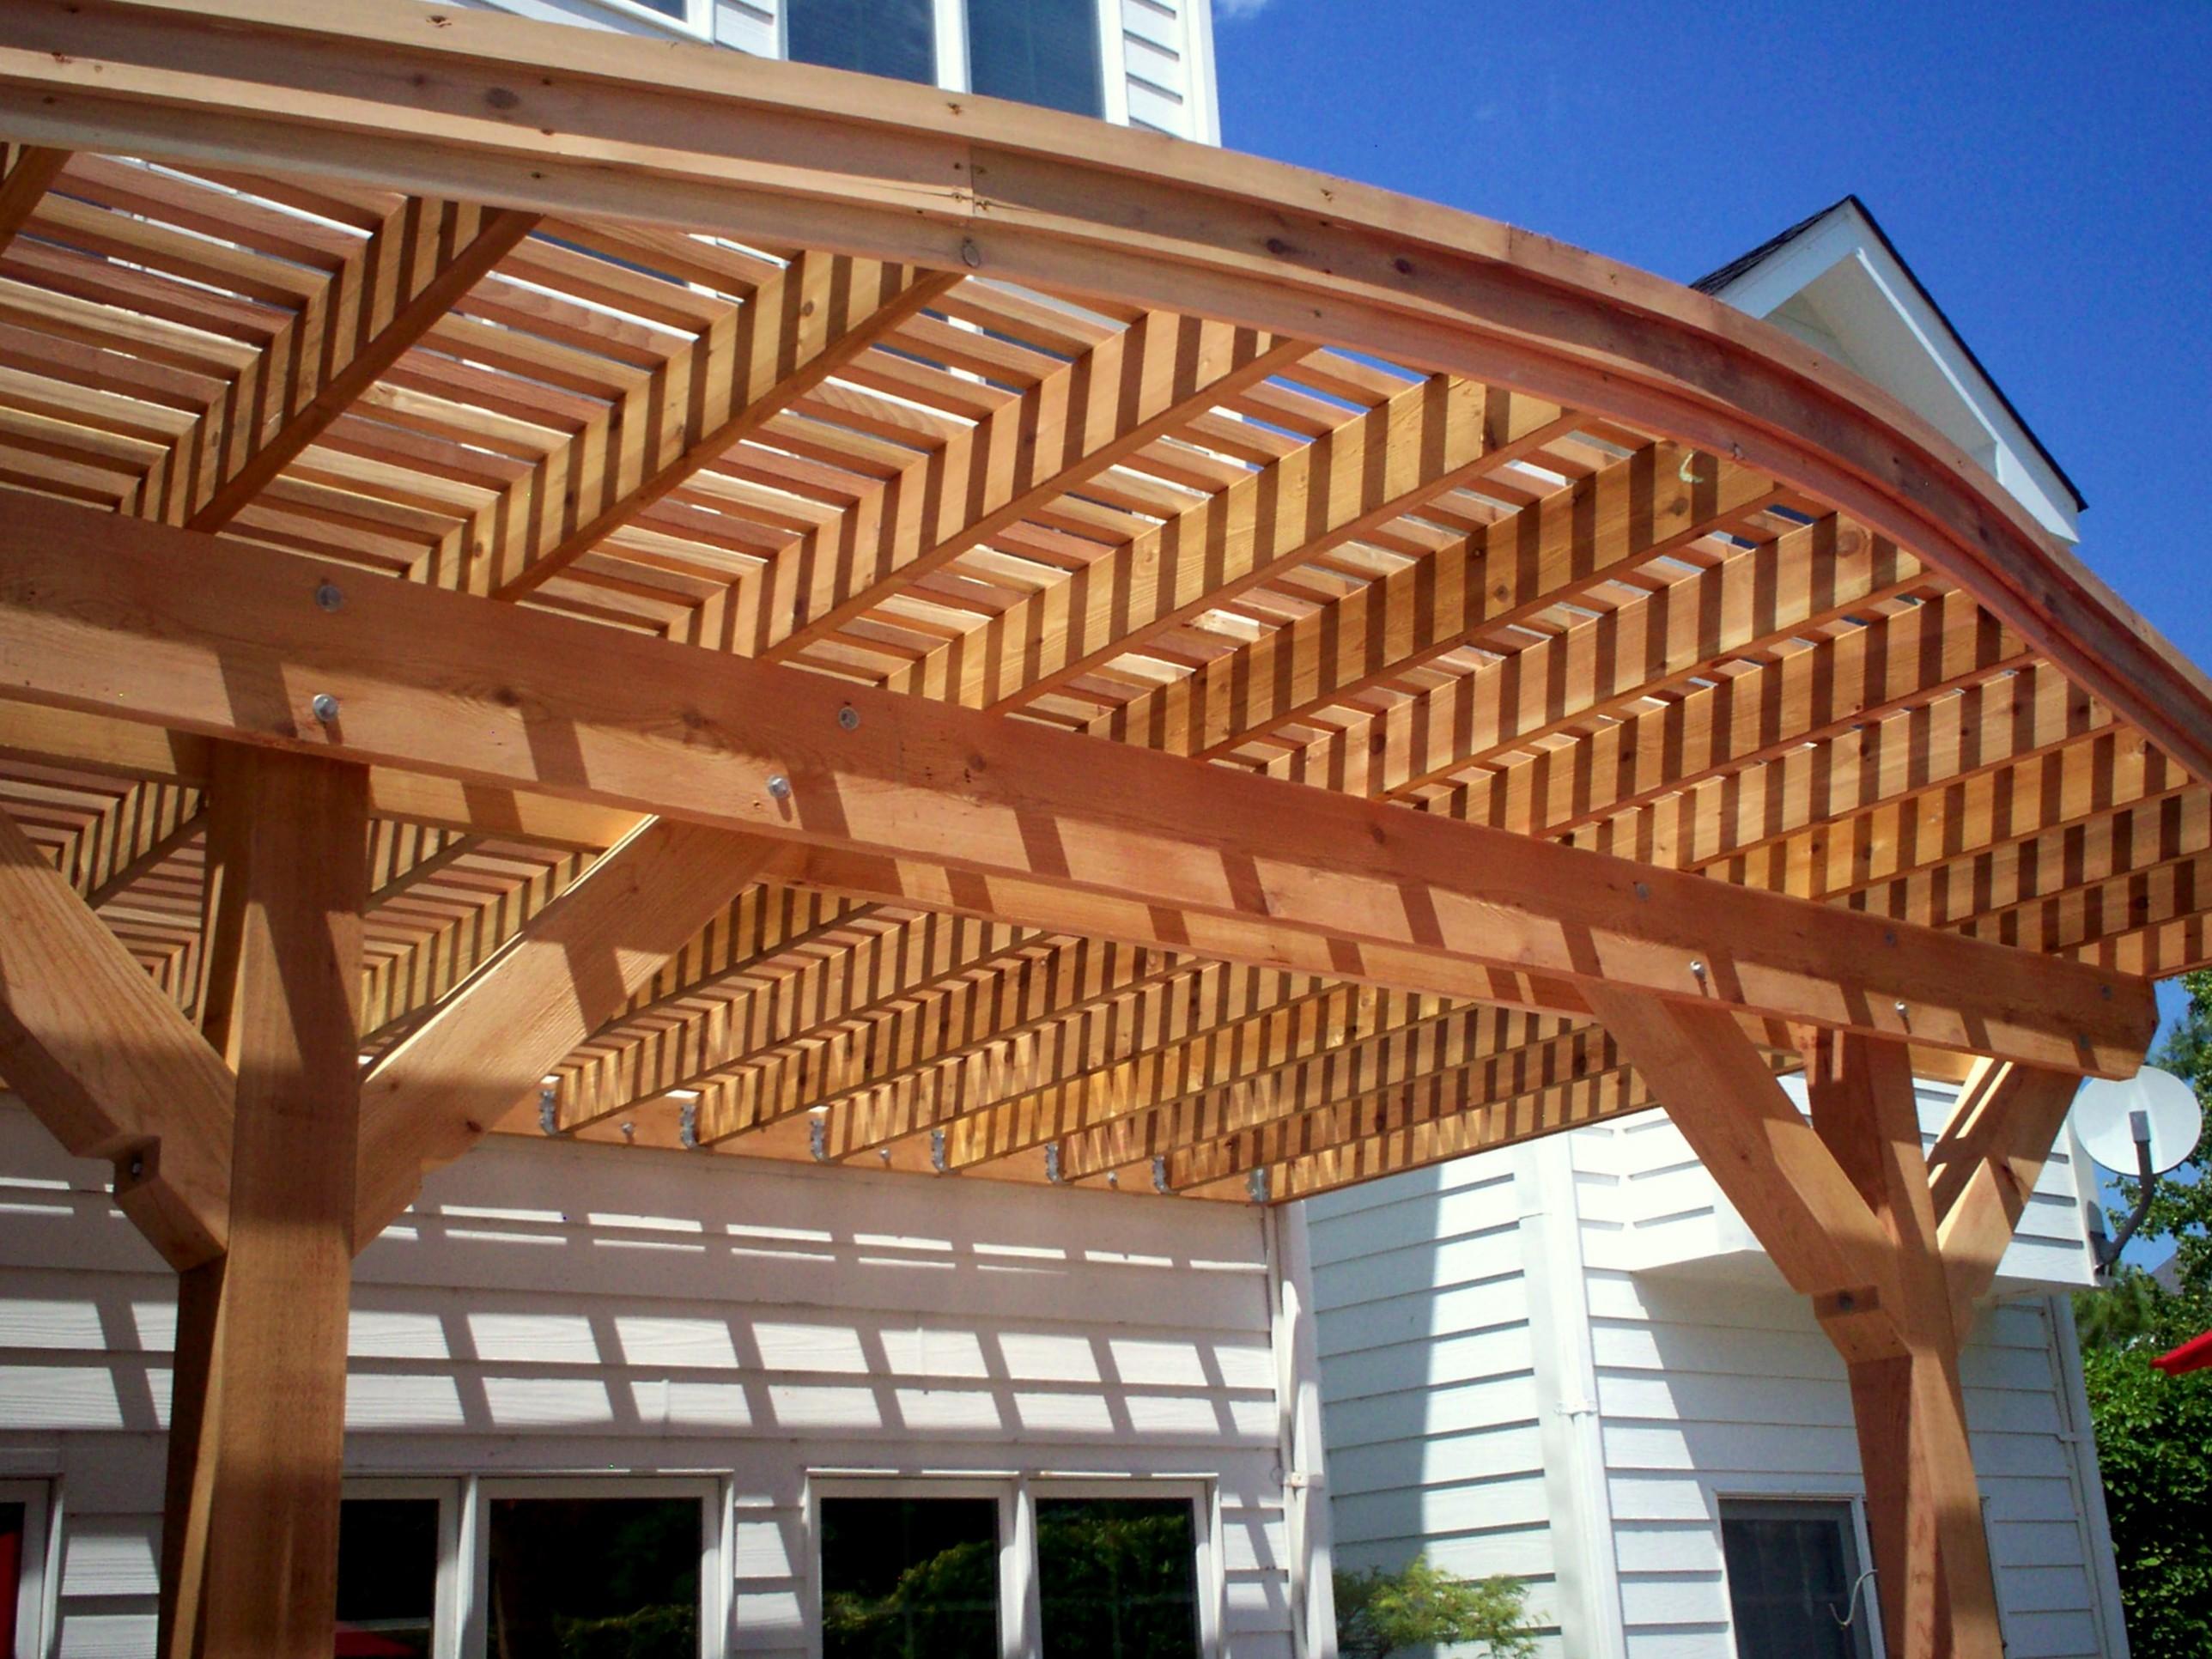 How To Build Arched Top Pergola Plans Pdf Plans